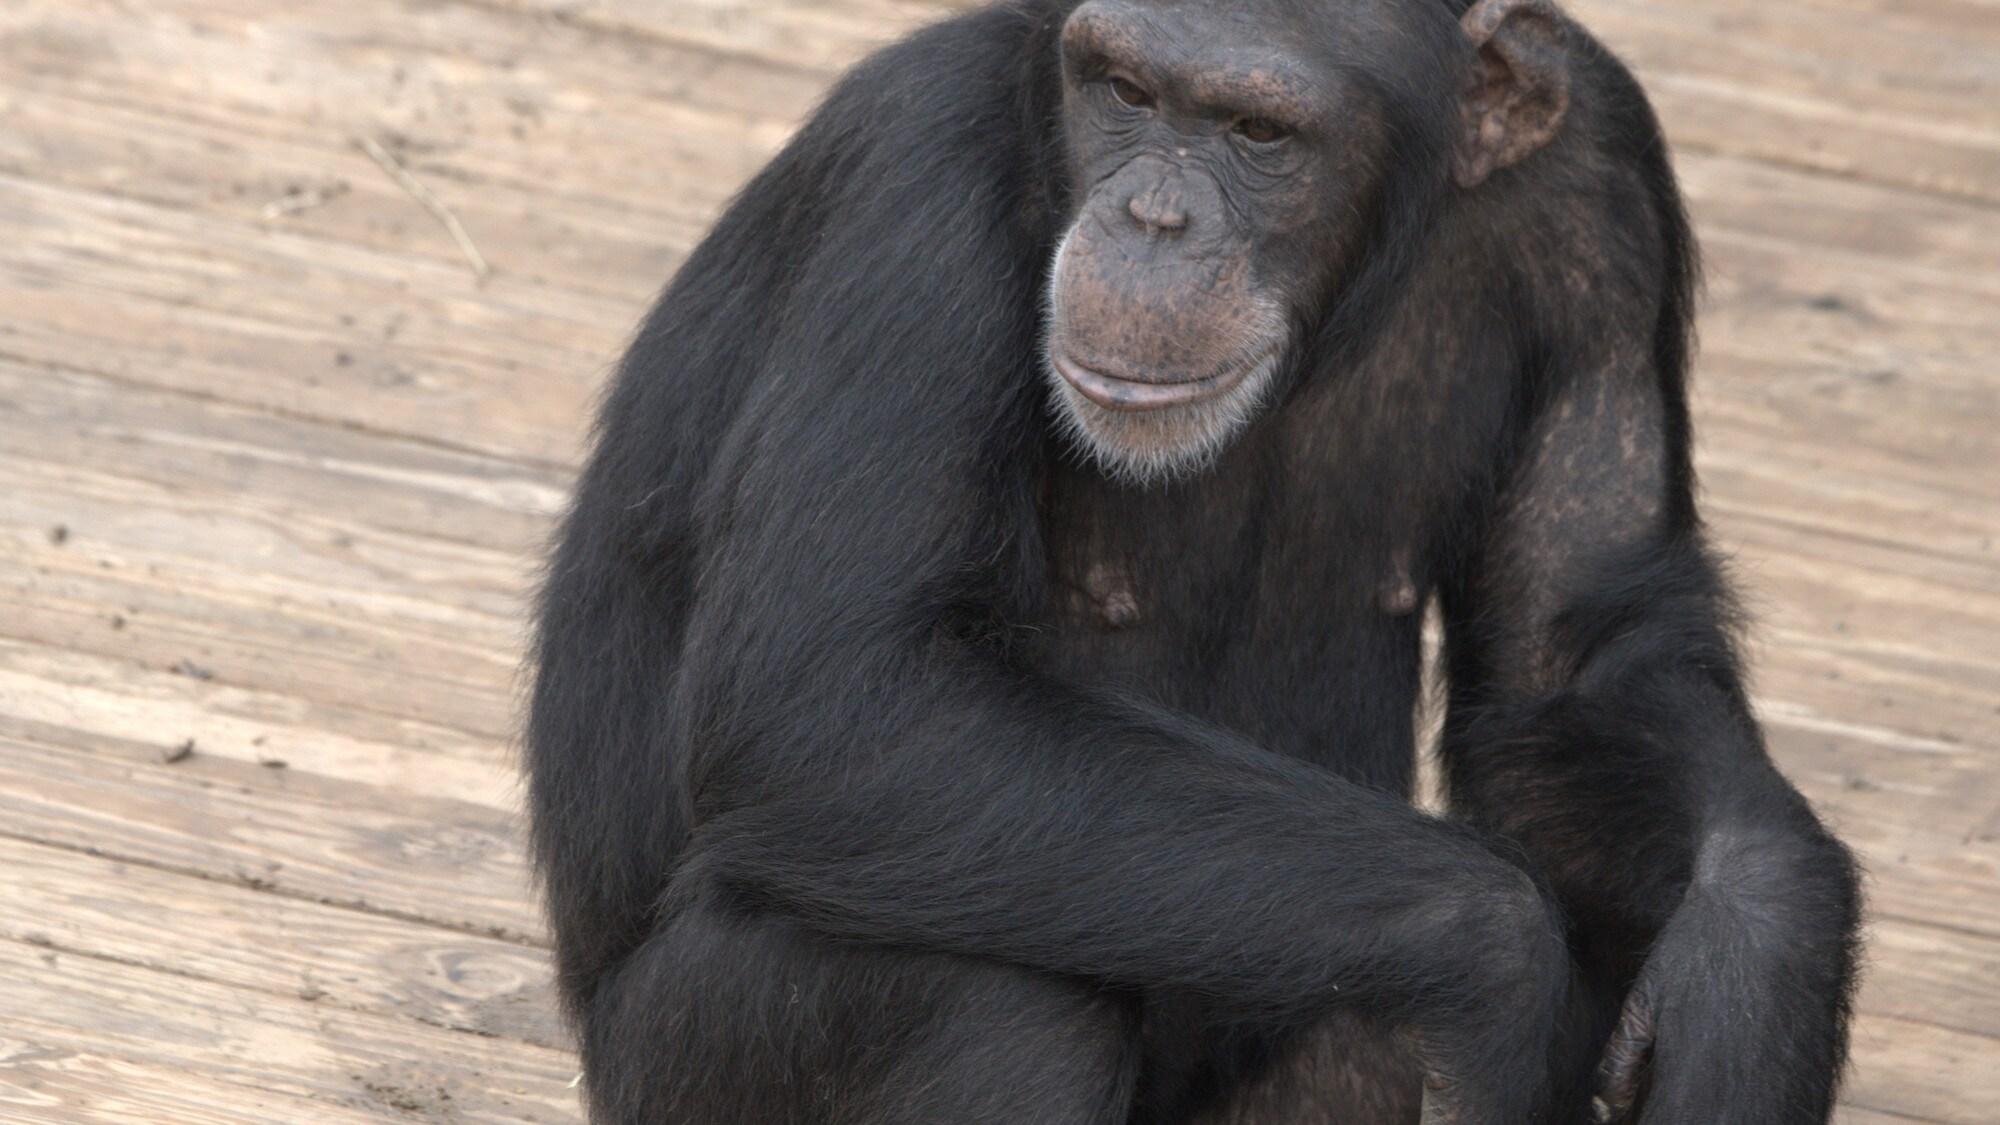 Portrait of Quilla on wooden platform, Slim's group. (National Geographic/Virginia Quinn)